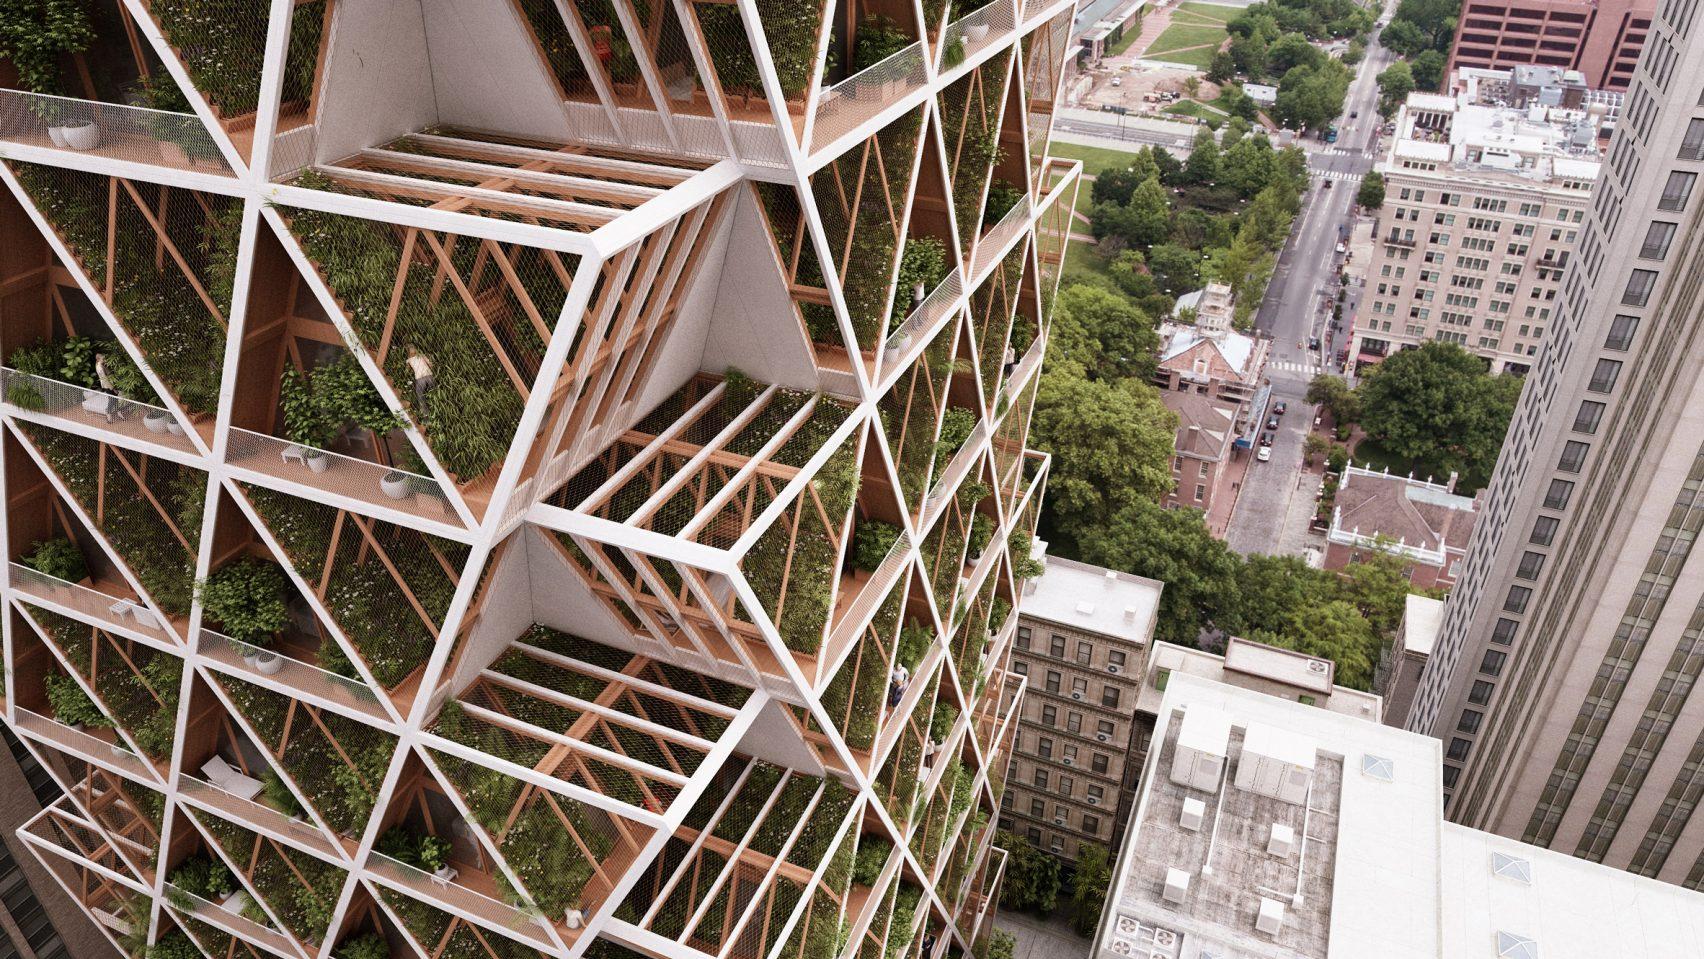 the-farmhouse-vertical-farm-apartments-precht-_dezeen_2364_hero_c-1704x959.jpg